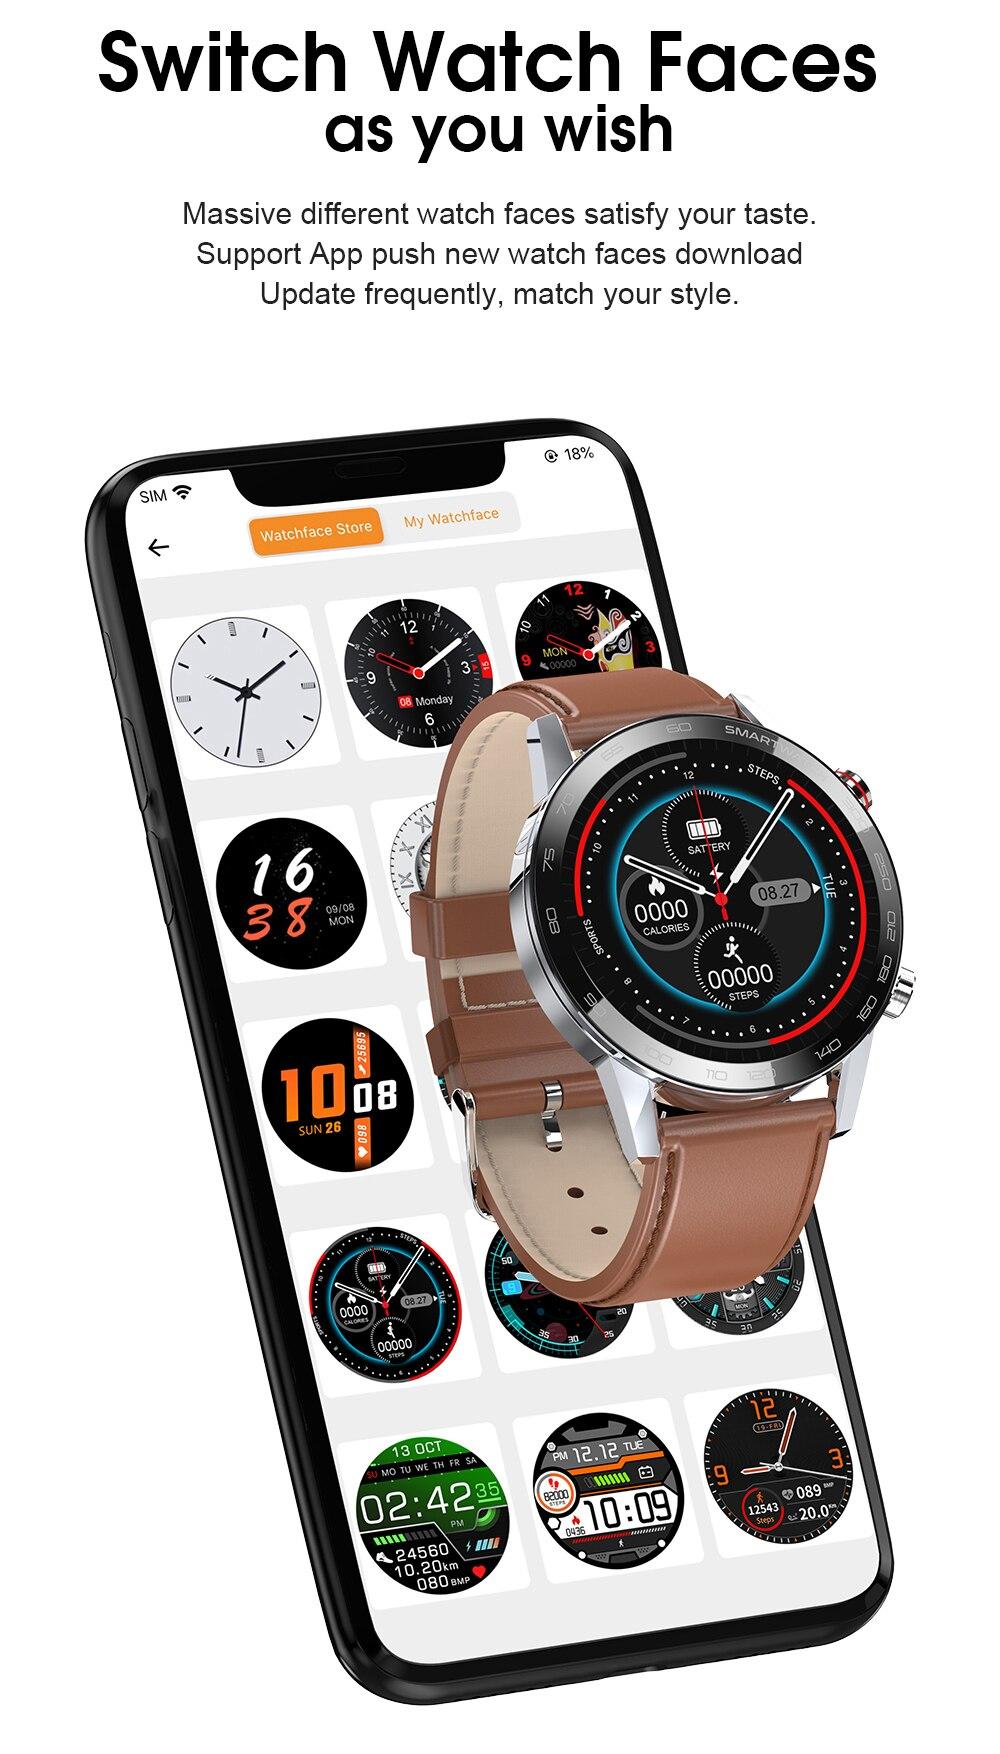 He1ddb57179d24b0f81e93ba83ad3ac82B Reloj Inteligente Hombre Smartwatch Ecg Ppg IP68 Smarthwatch Men Full Touch Smart Watch 2020 For Huawei Xiaomi Android Apple IOS